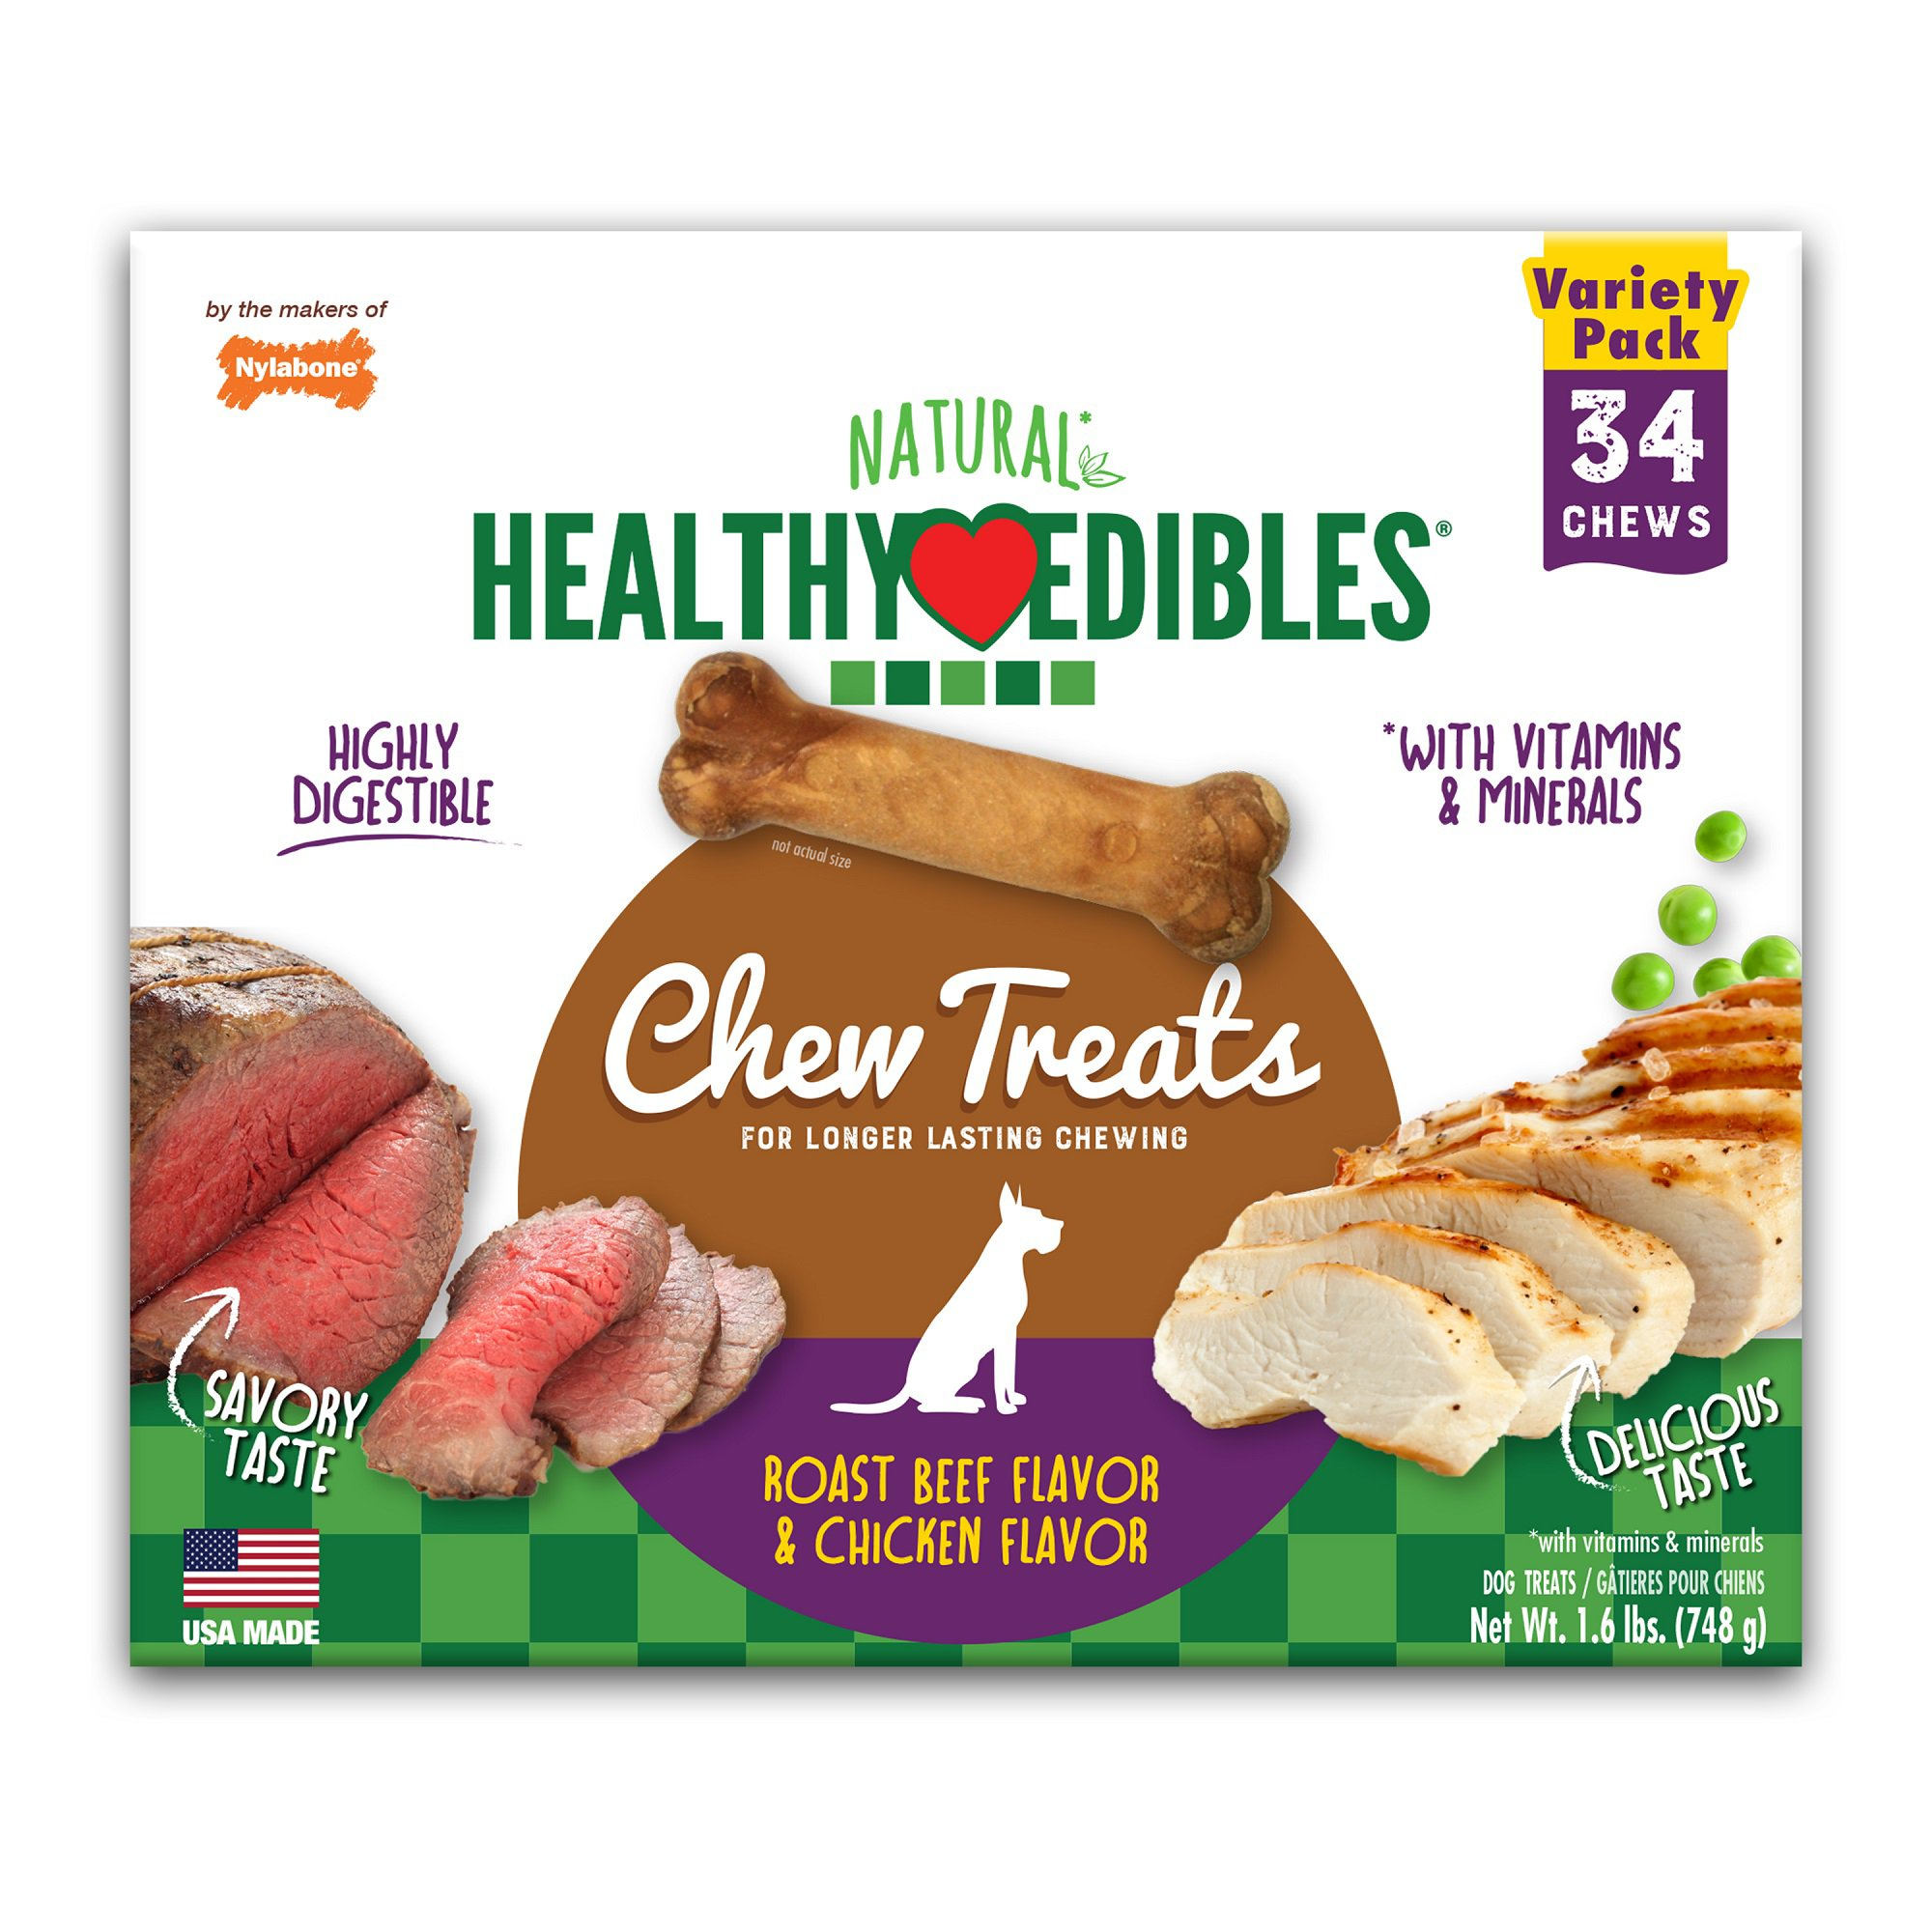 Nylabone Healthy Edibles 2 Flavor Variety Pack Dog Bone Chews